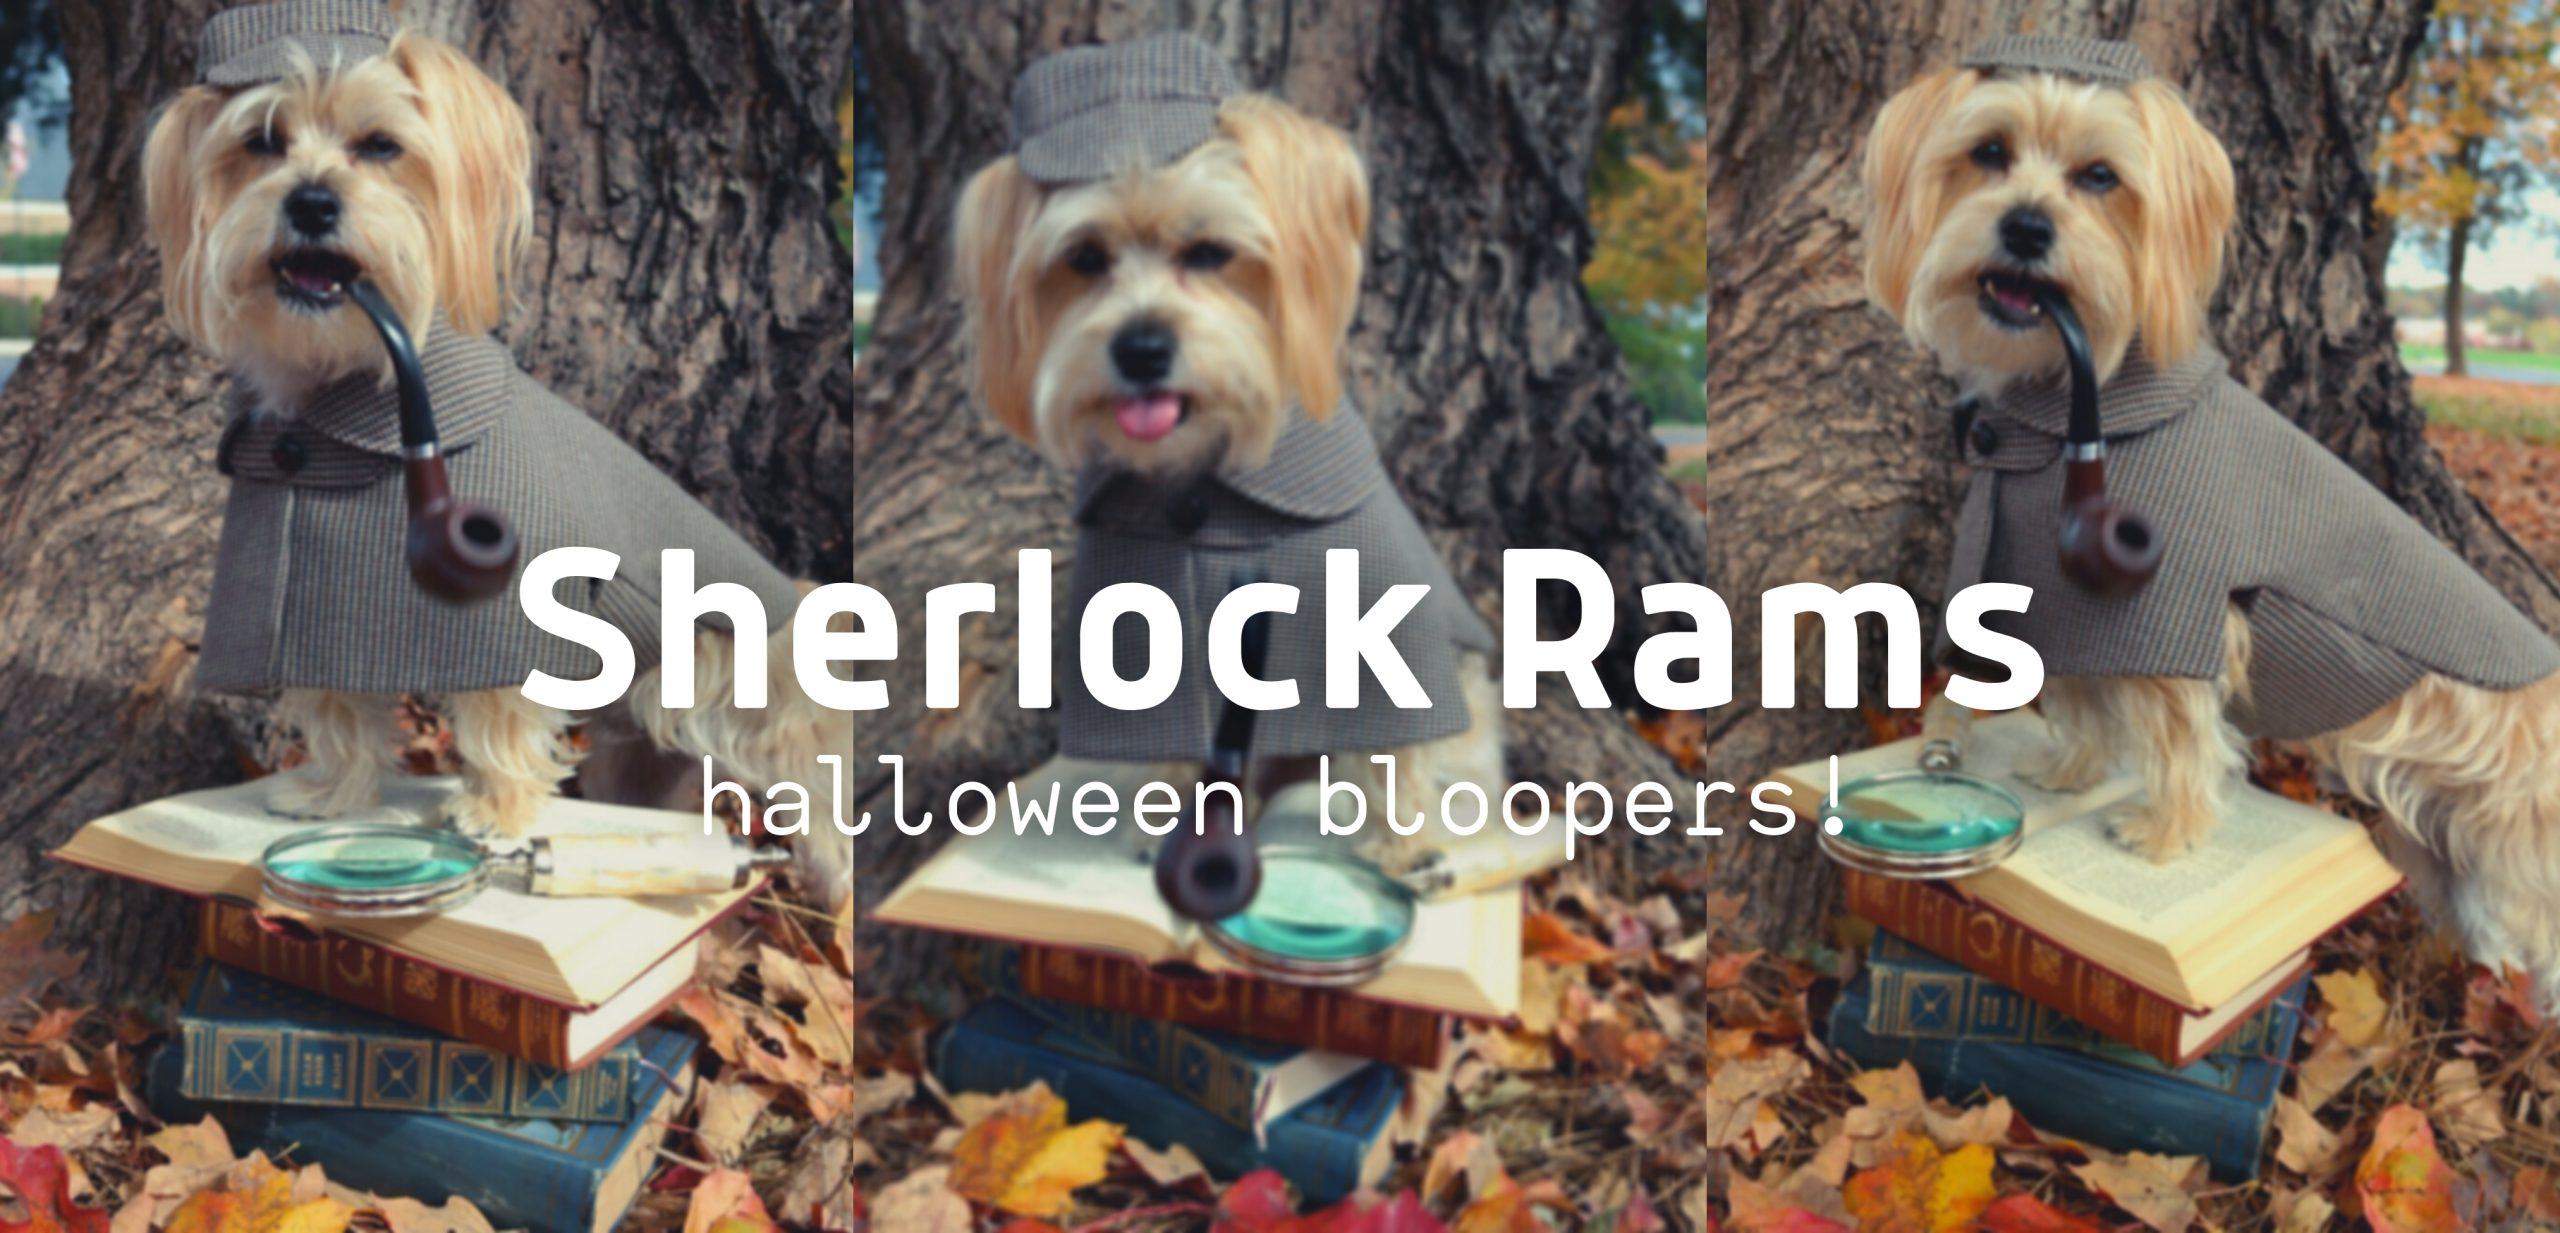 Sherlock Rams Halloween Bloopers!